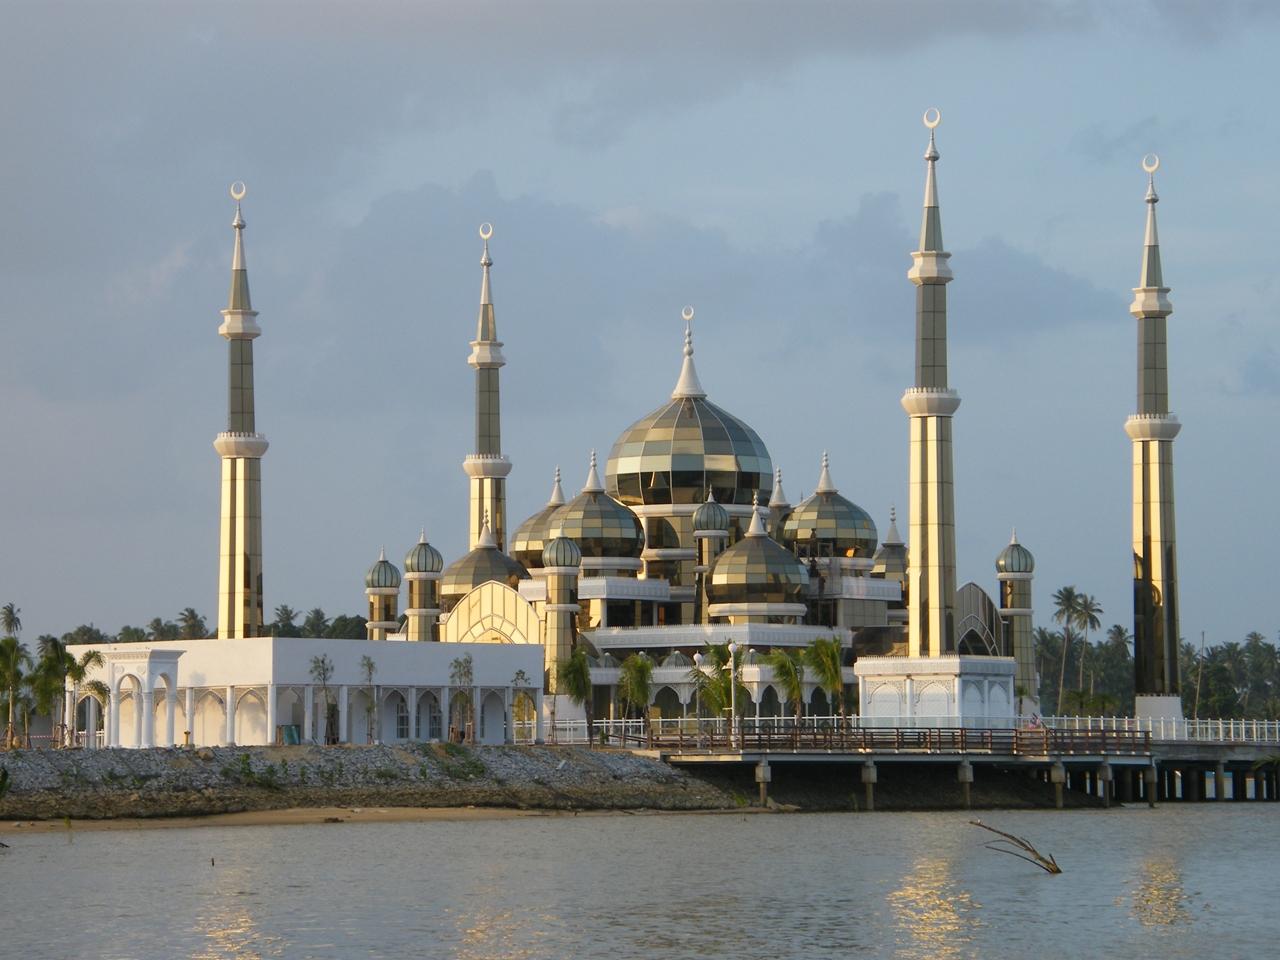 Bus From Singapore to Terengganu